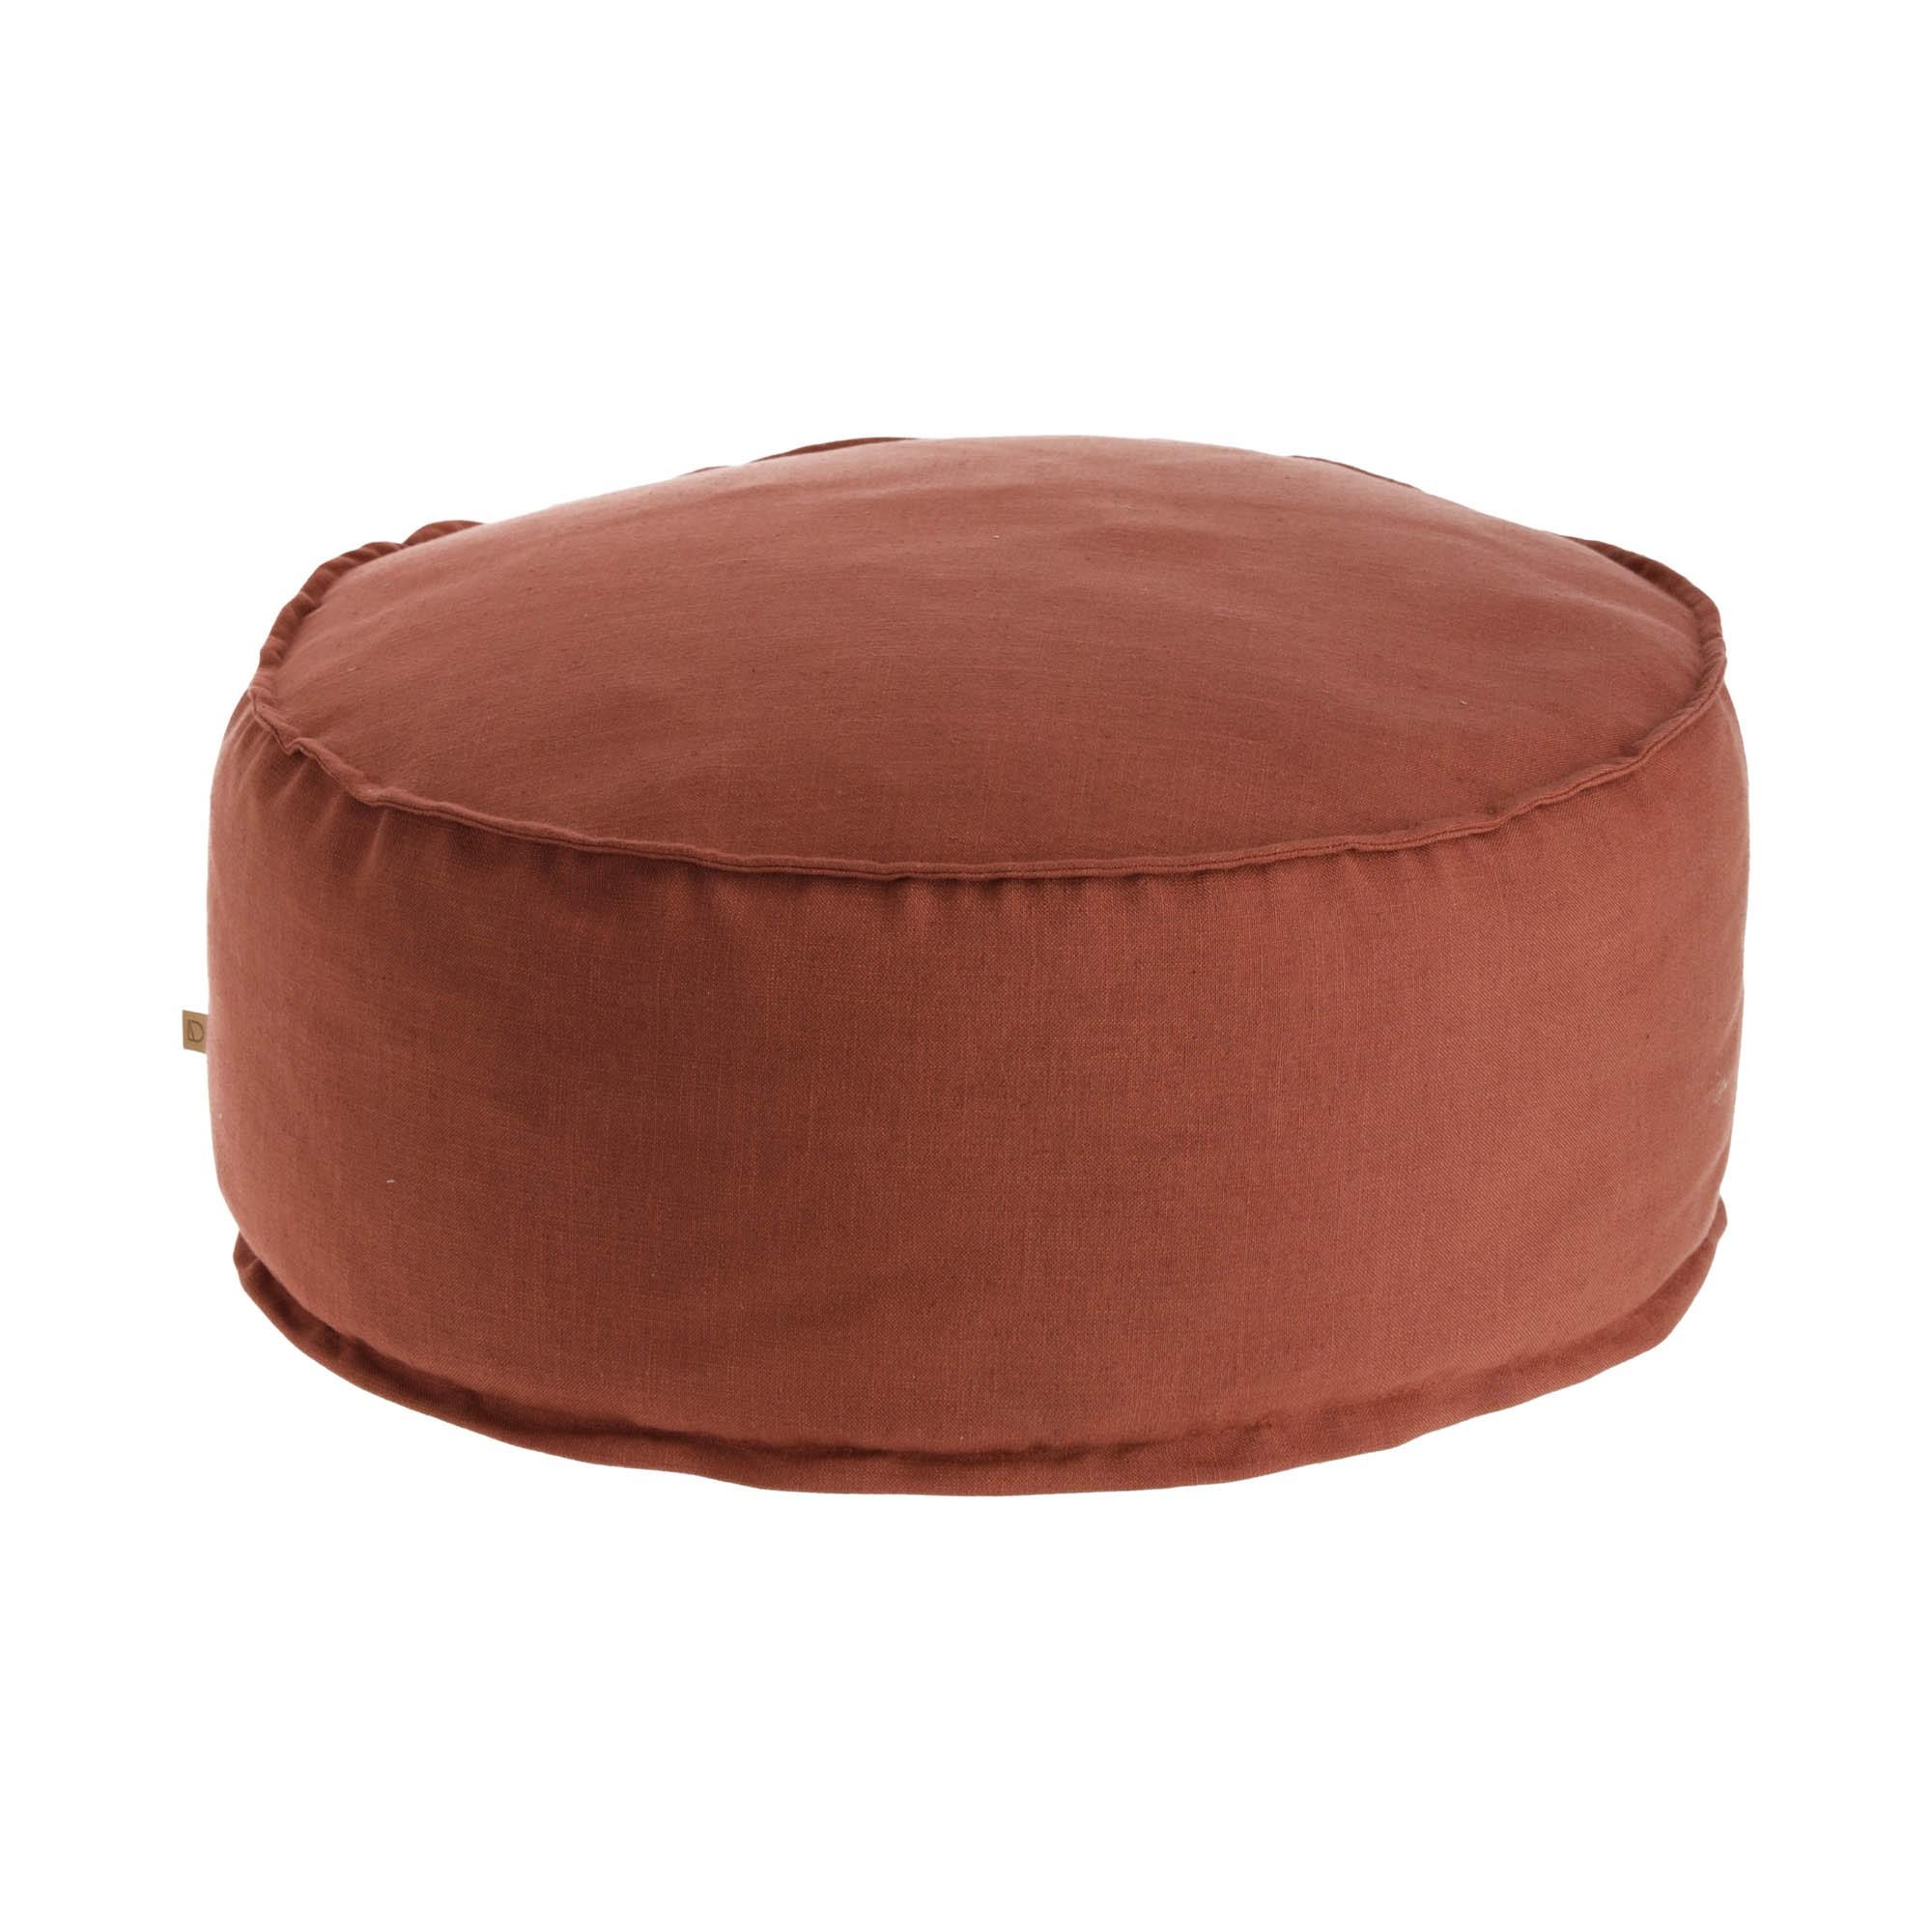 Moana Fabric Round Pouf, Maroon